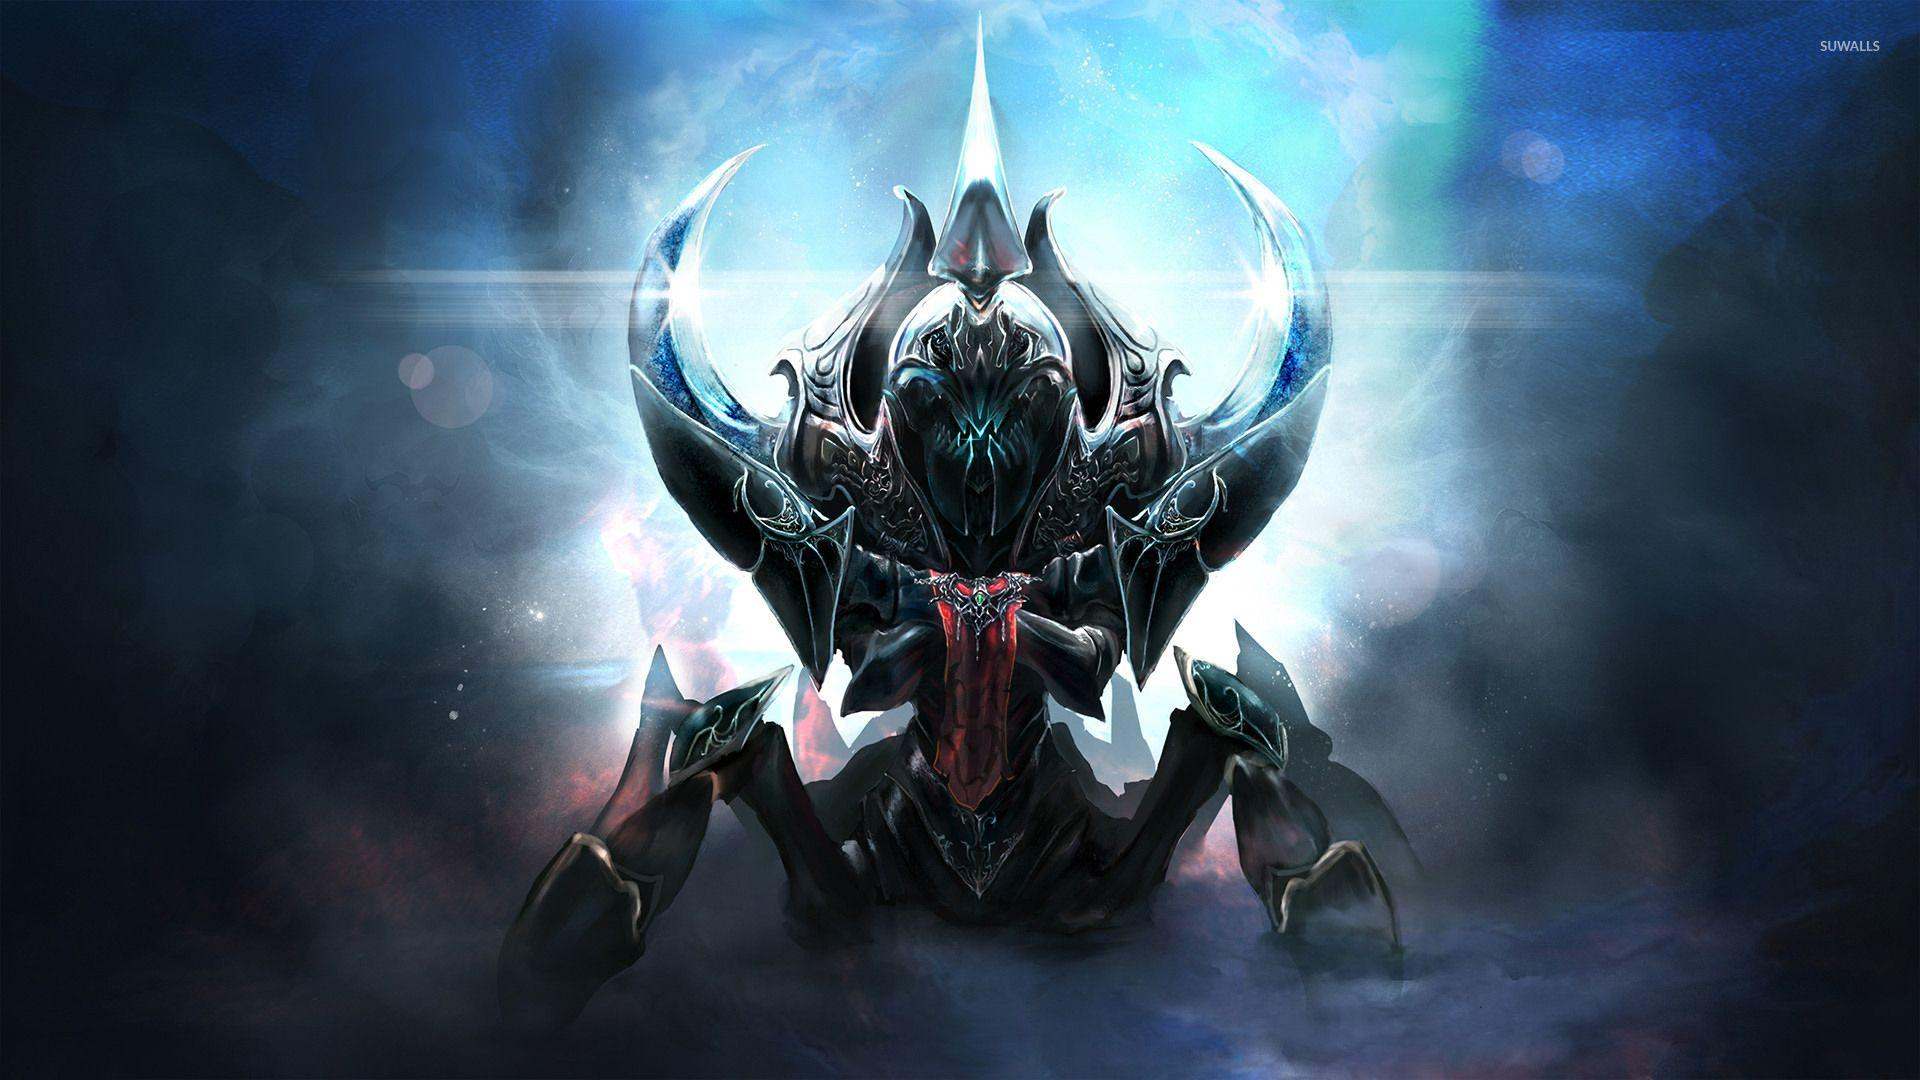 Demon King Wallpapers